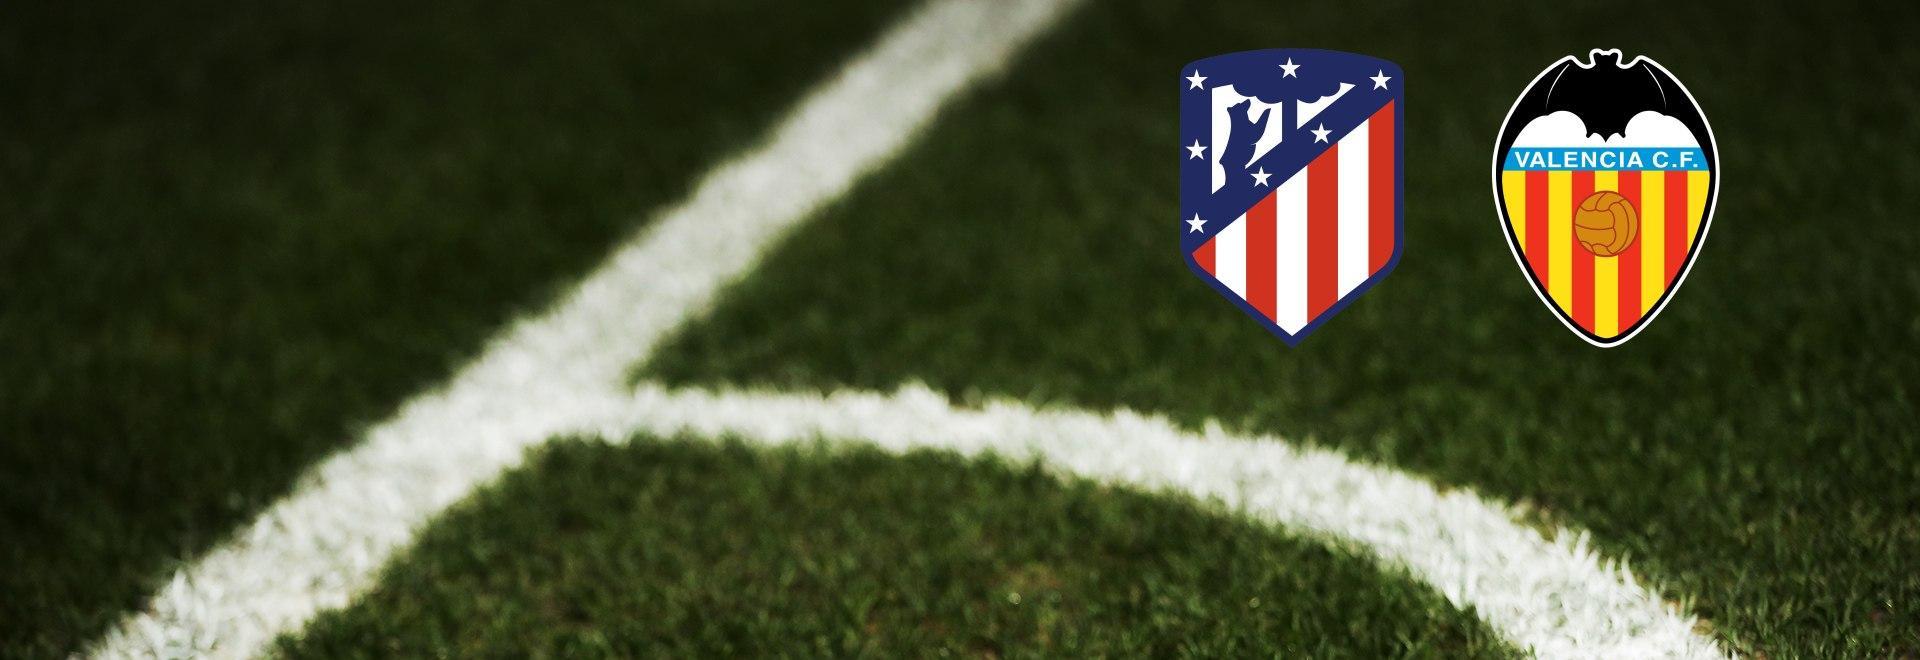 Atletico Madrid - Valencia. 20a g.